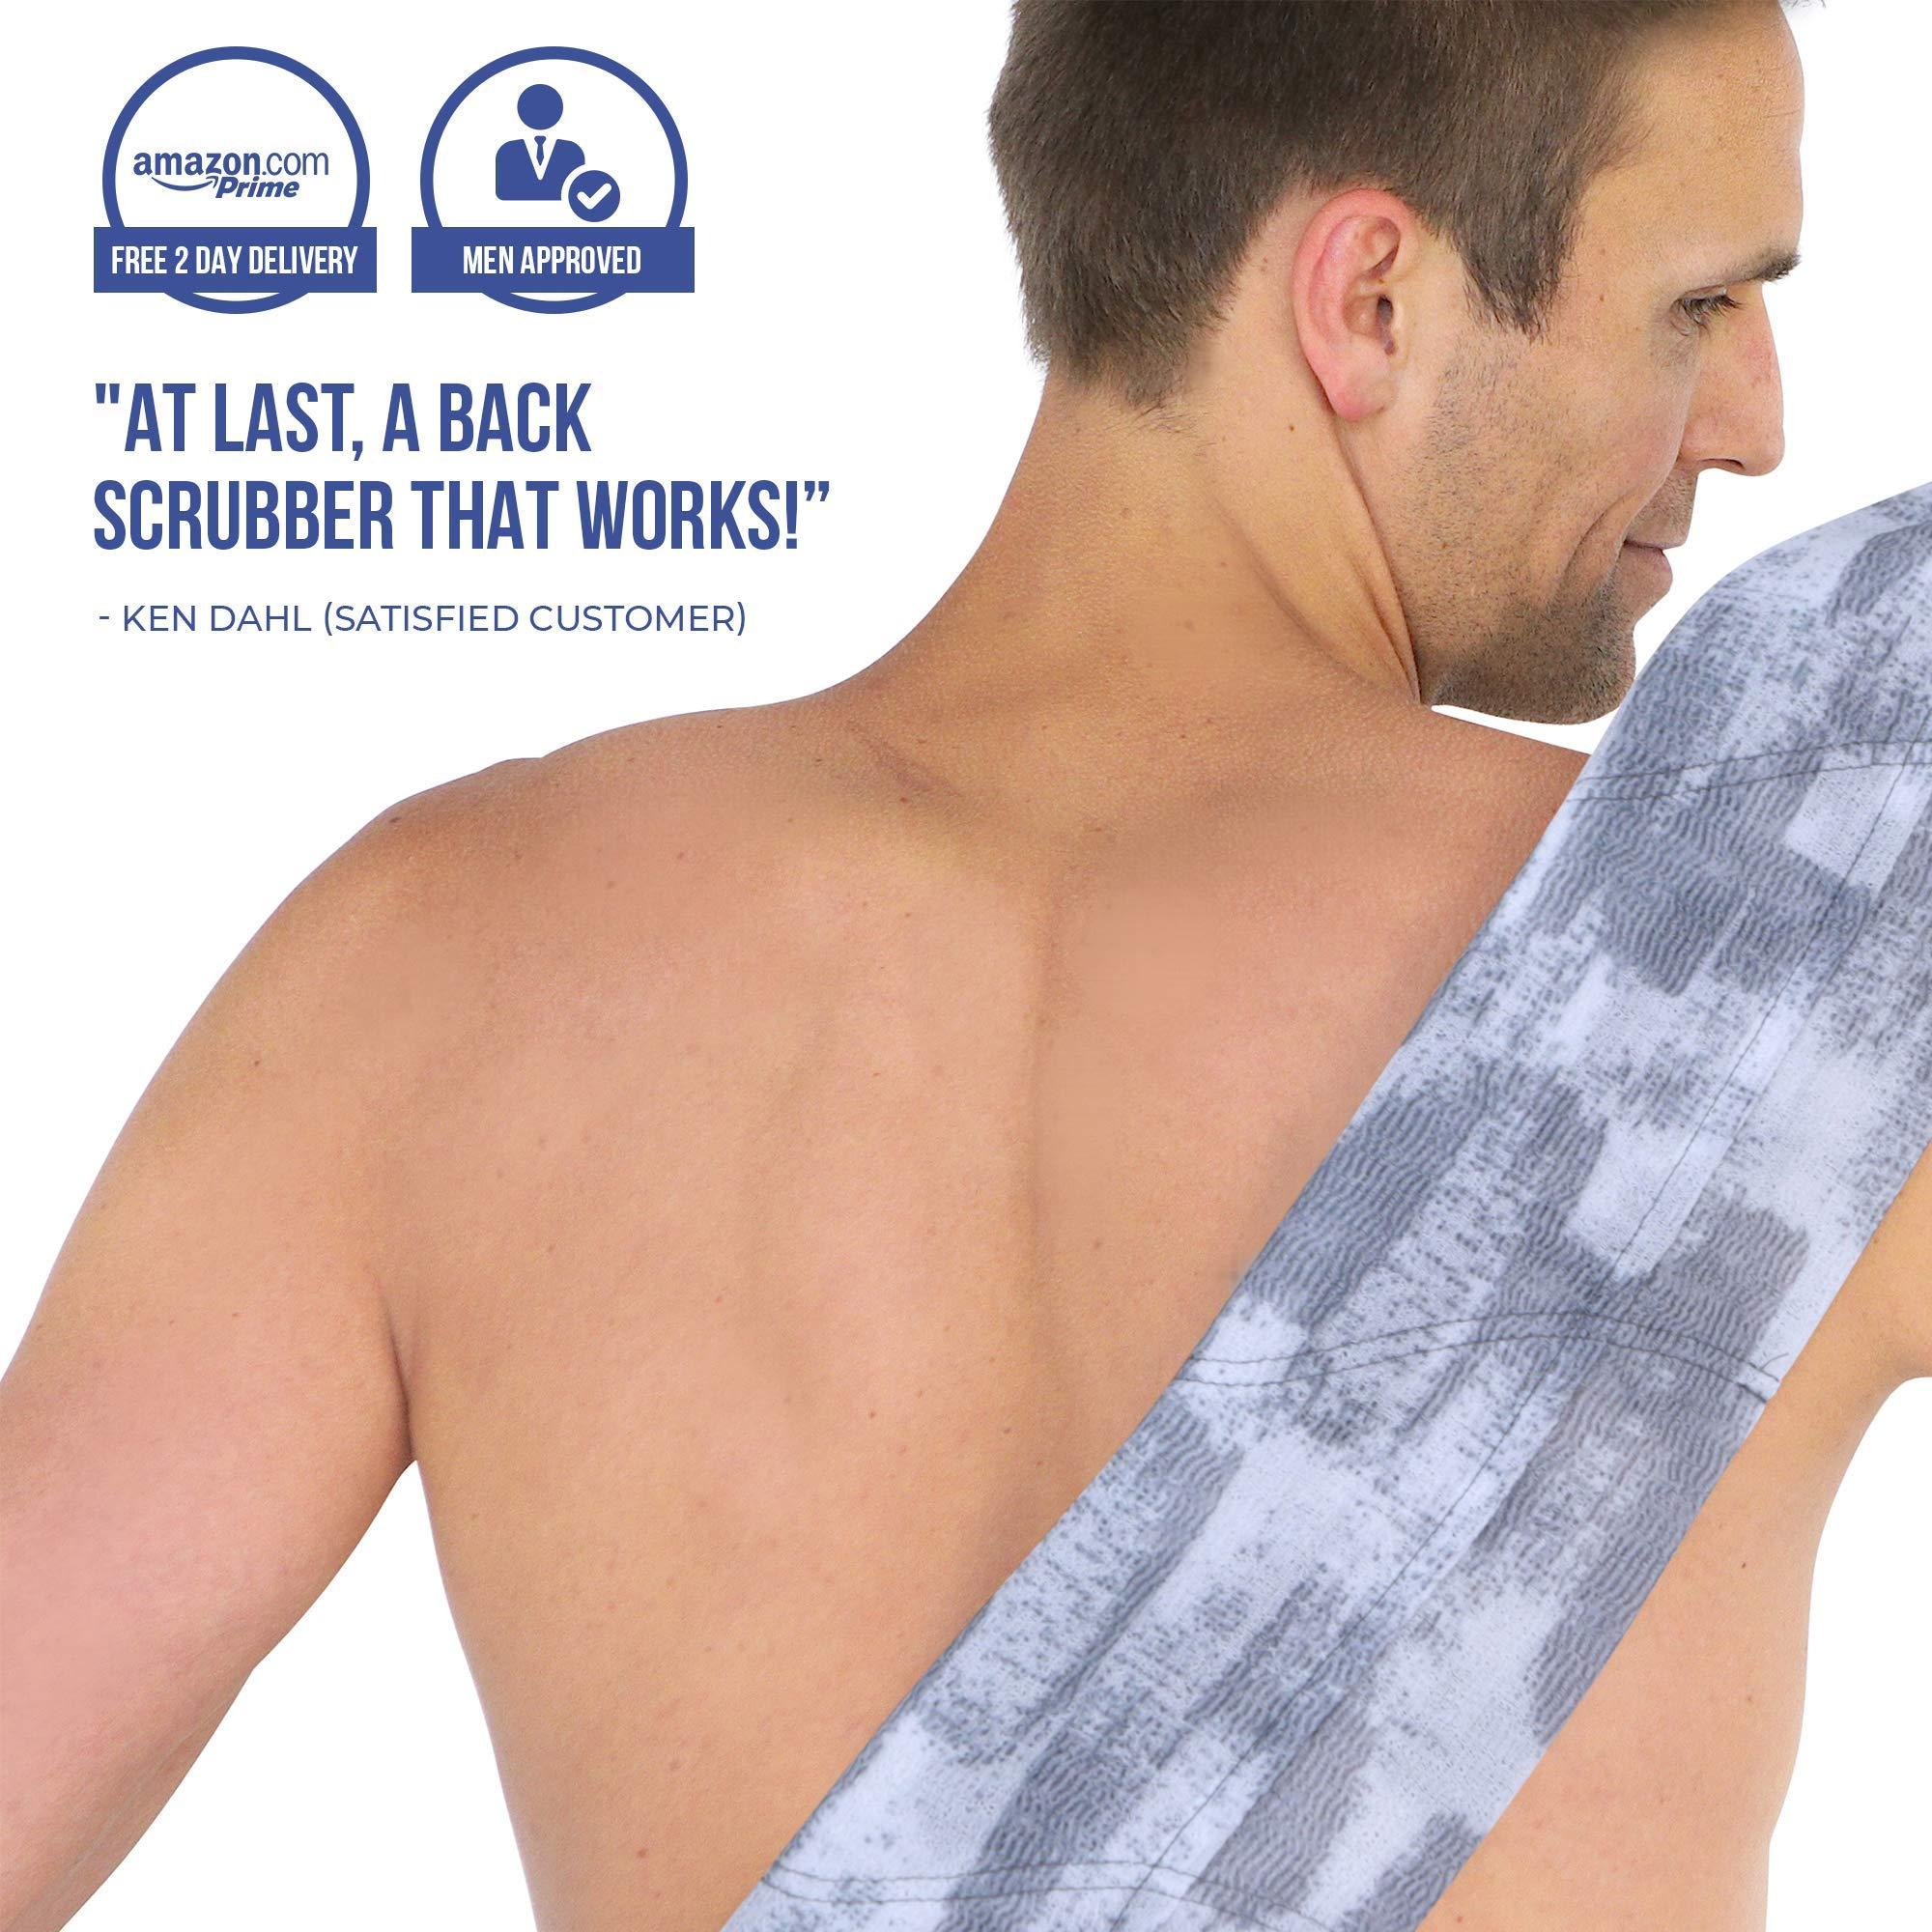 SoapSleeve Exfoliating Loofah Sponge: Long Back Scrubber Shower & Bath Body Lufa for Men & Women| Exfoliating Back Scrubber Loofah To Exfoliate, Rejuvenate & Relax Your Body - BRADLEY